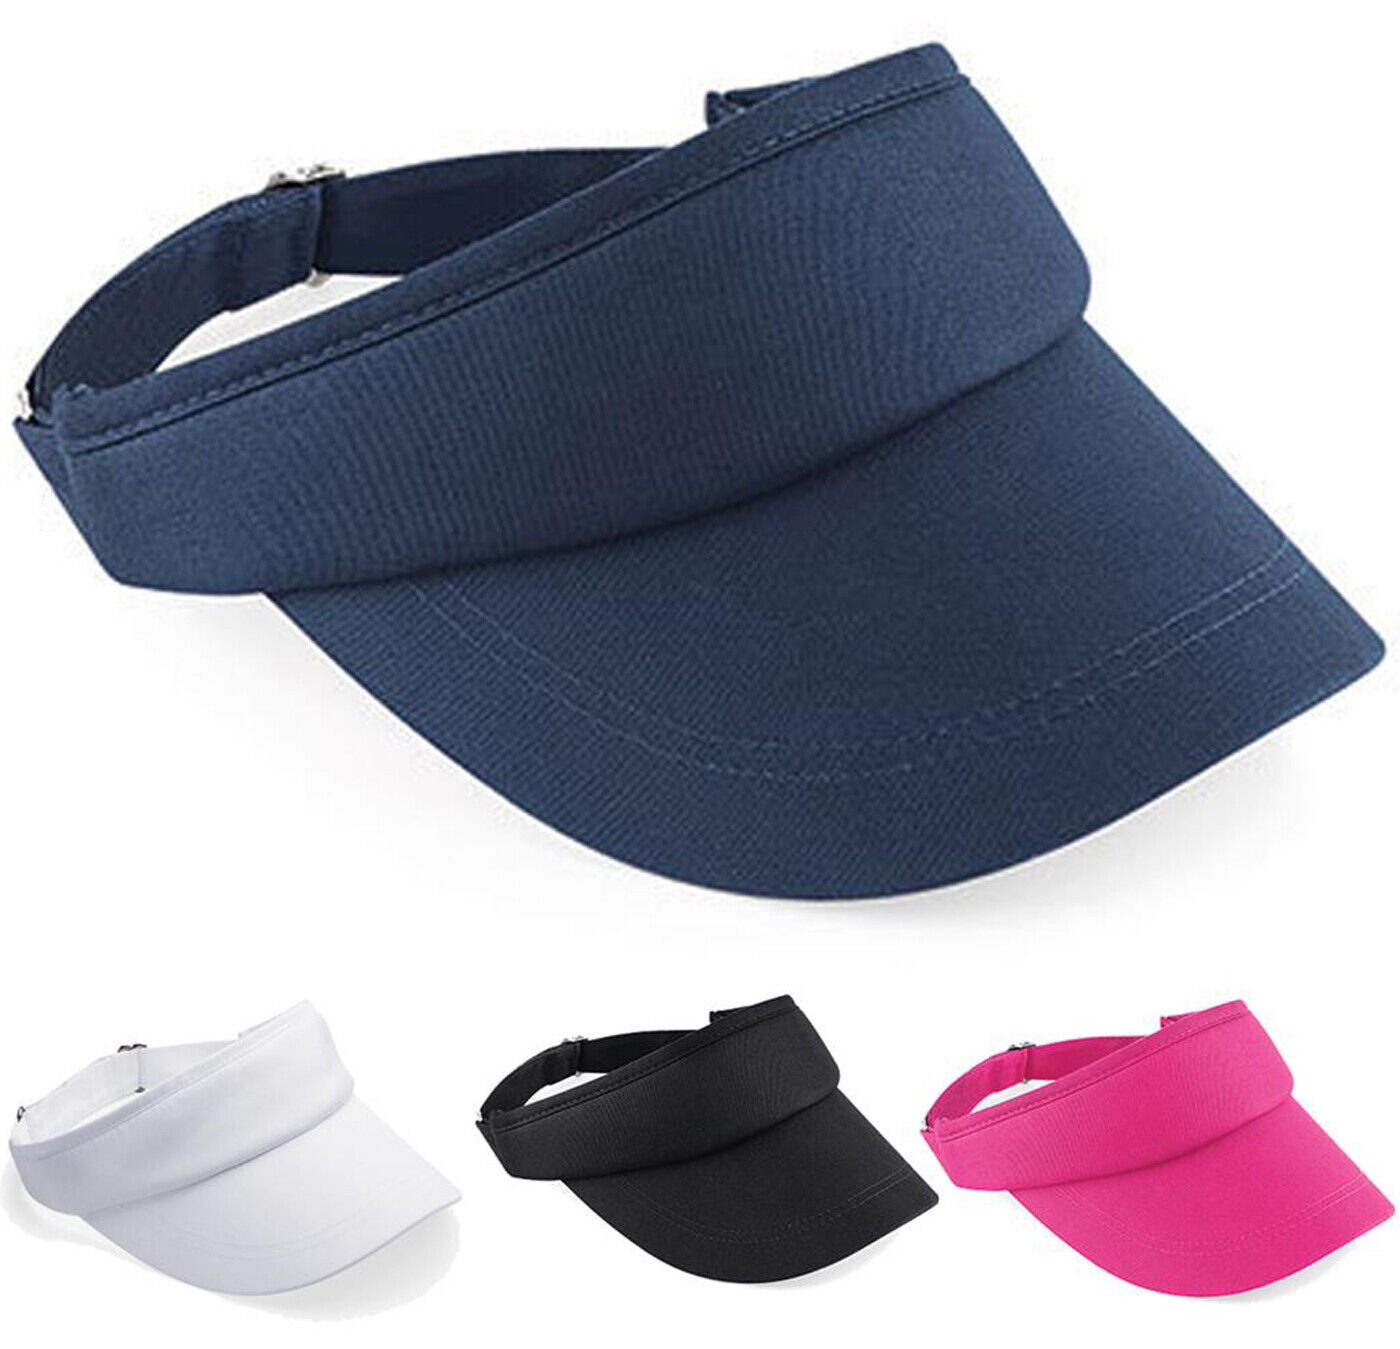 Stable Mens Womens Sun Visor Sun Visor UV Protection Wide Brim Sports New